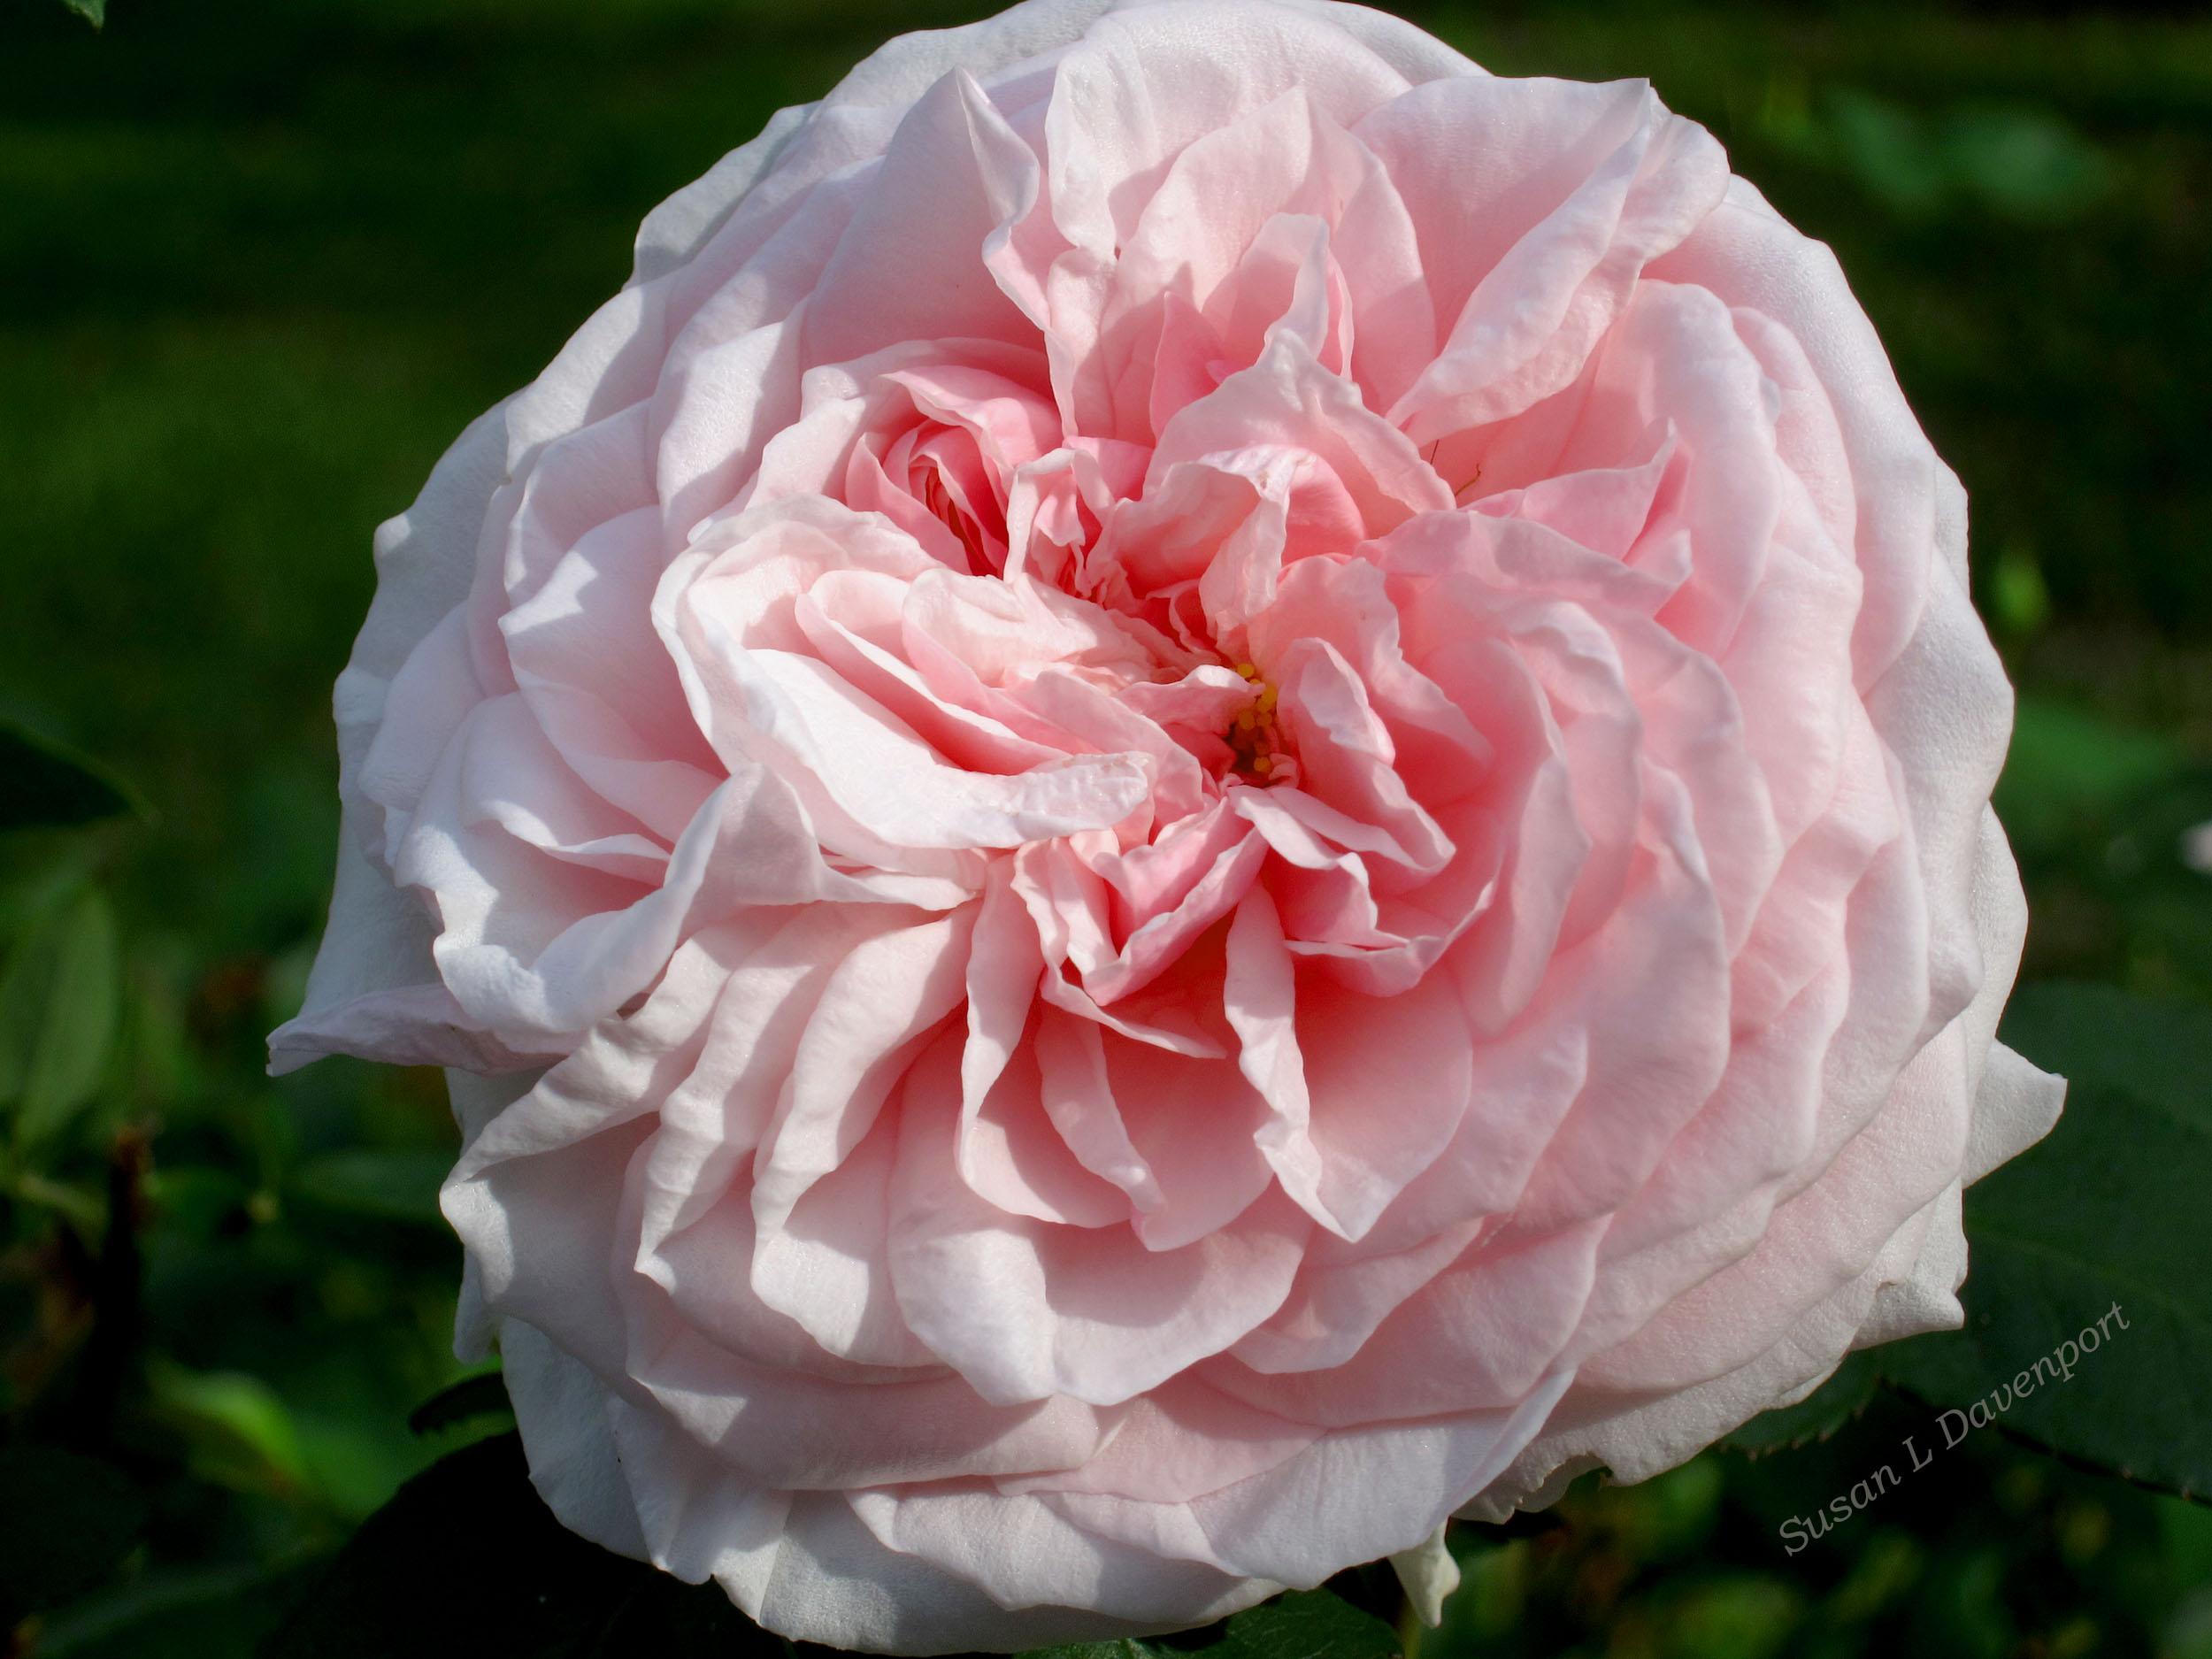 Soft Pink Velvet - Photo by Susan L. Davenport